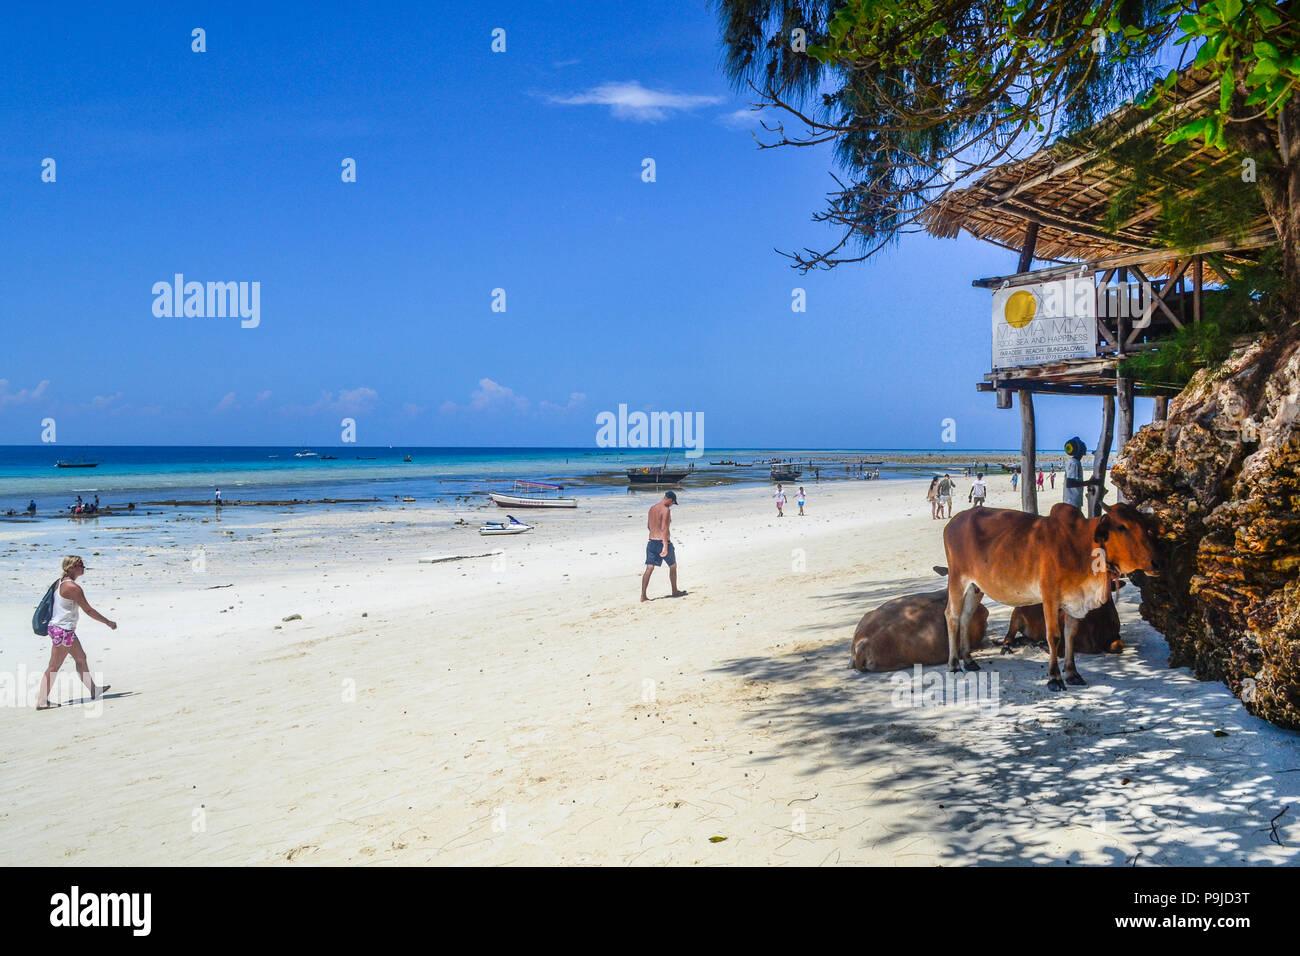 local life on paradise island Zanzibar - Stock Image